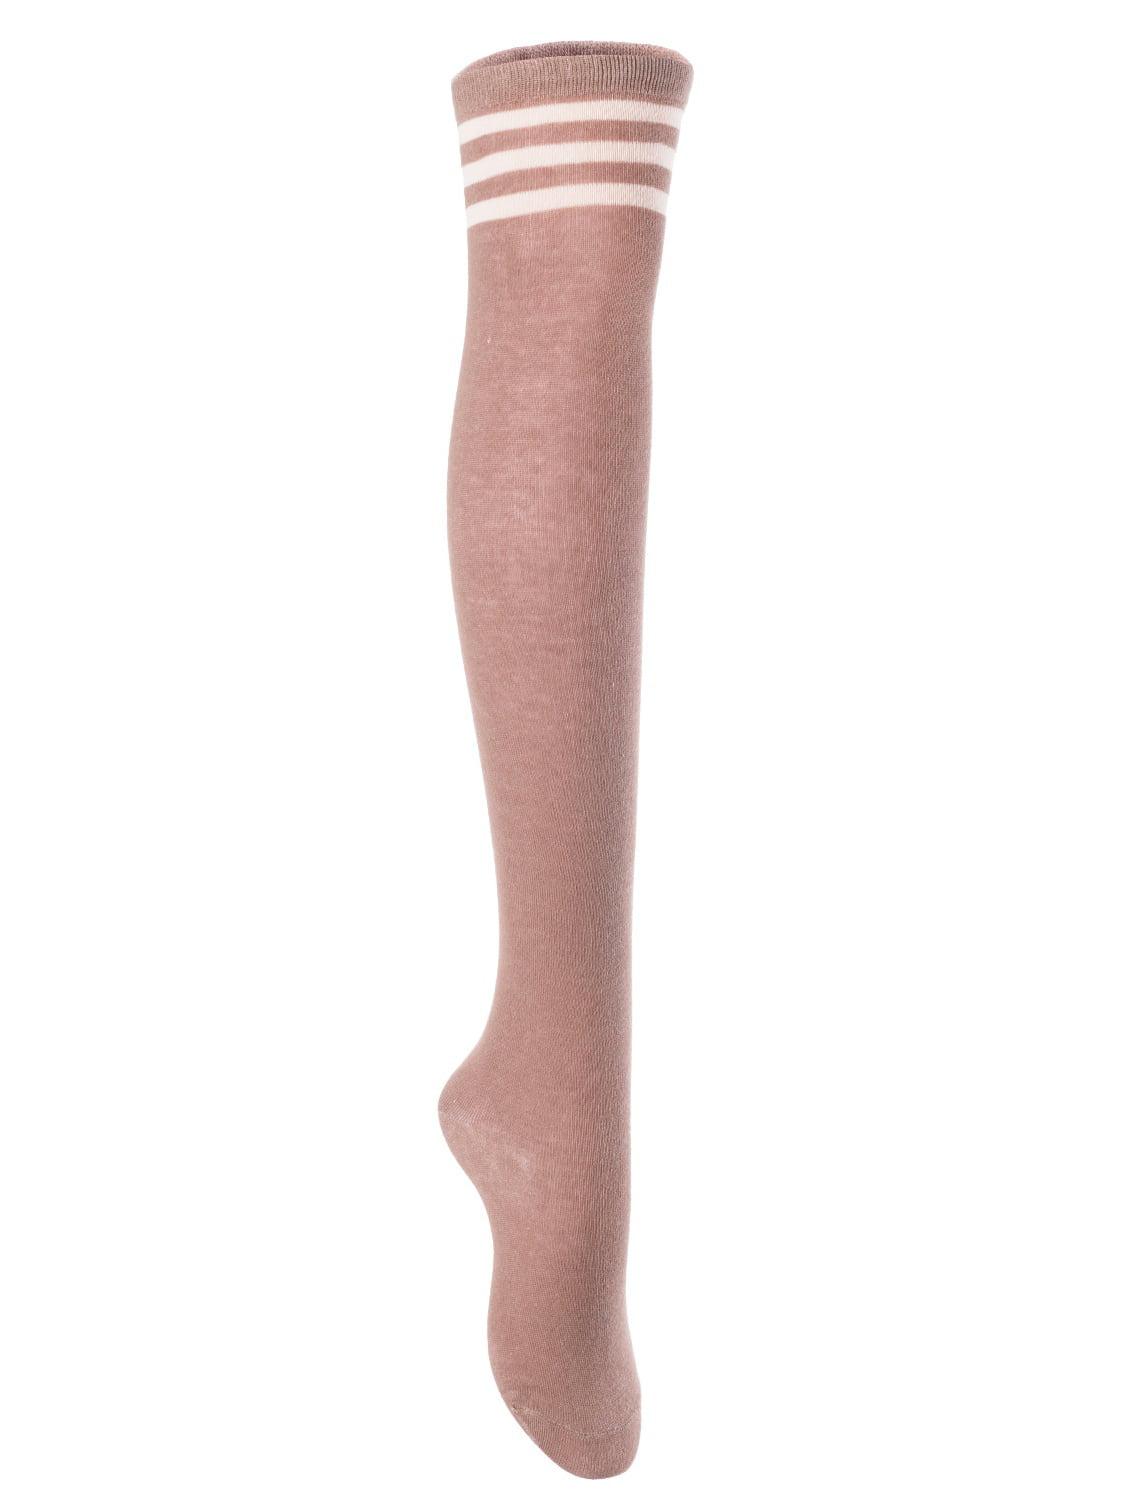 Big Girls' Women's 1 Pair Over Knee High Thigh High Cotton Socks Leg Warmers J1022 Size L/XL(Navy) 4p1c6